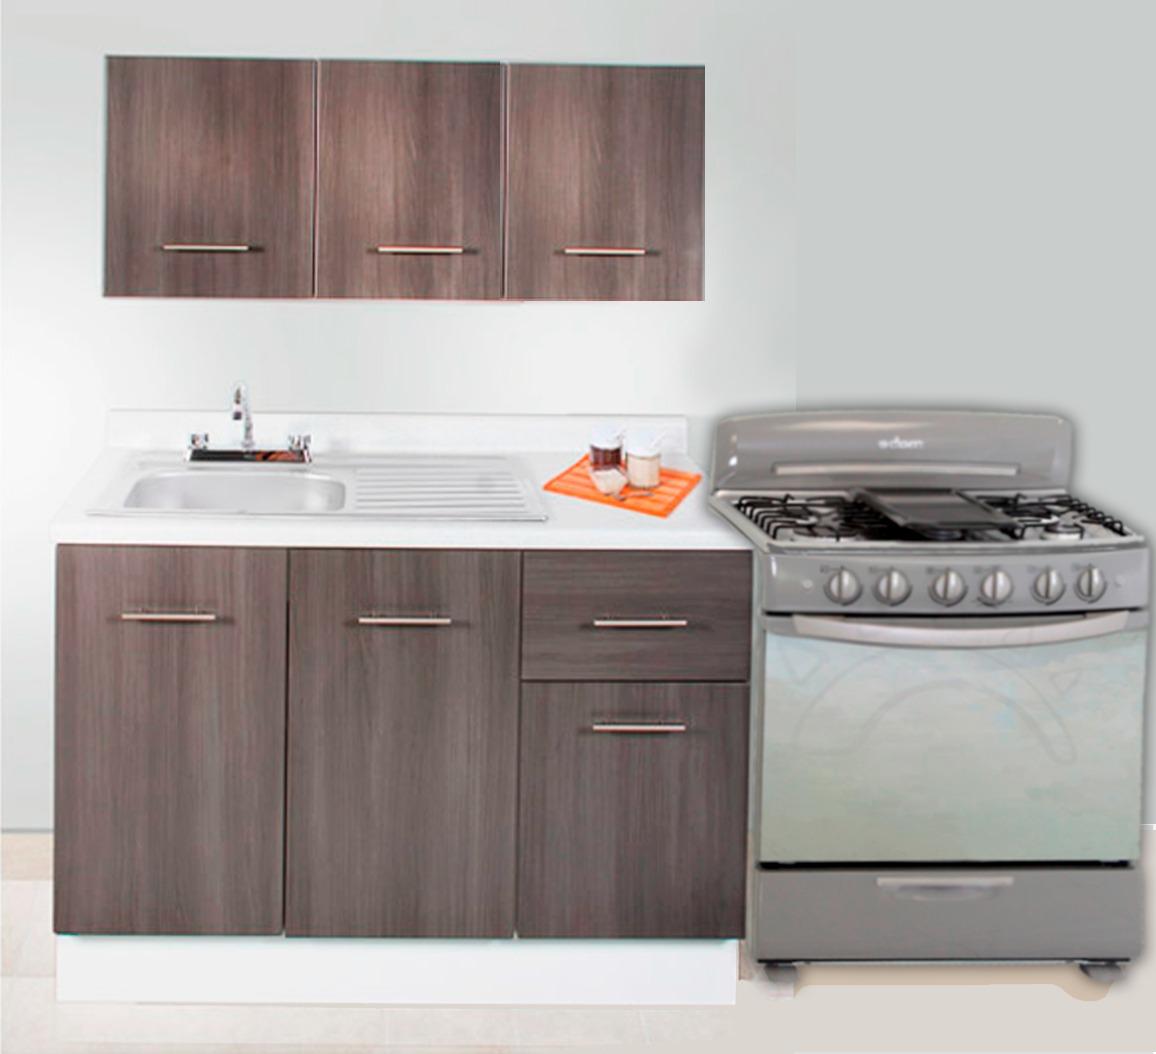 Cocina integral minimalista mod hamburgo para estufa 2m for Cocina integral